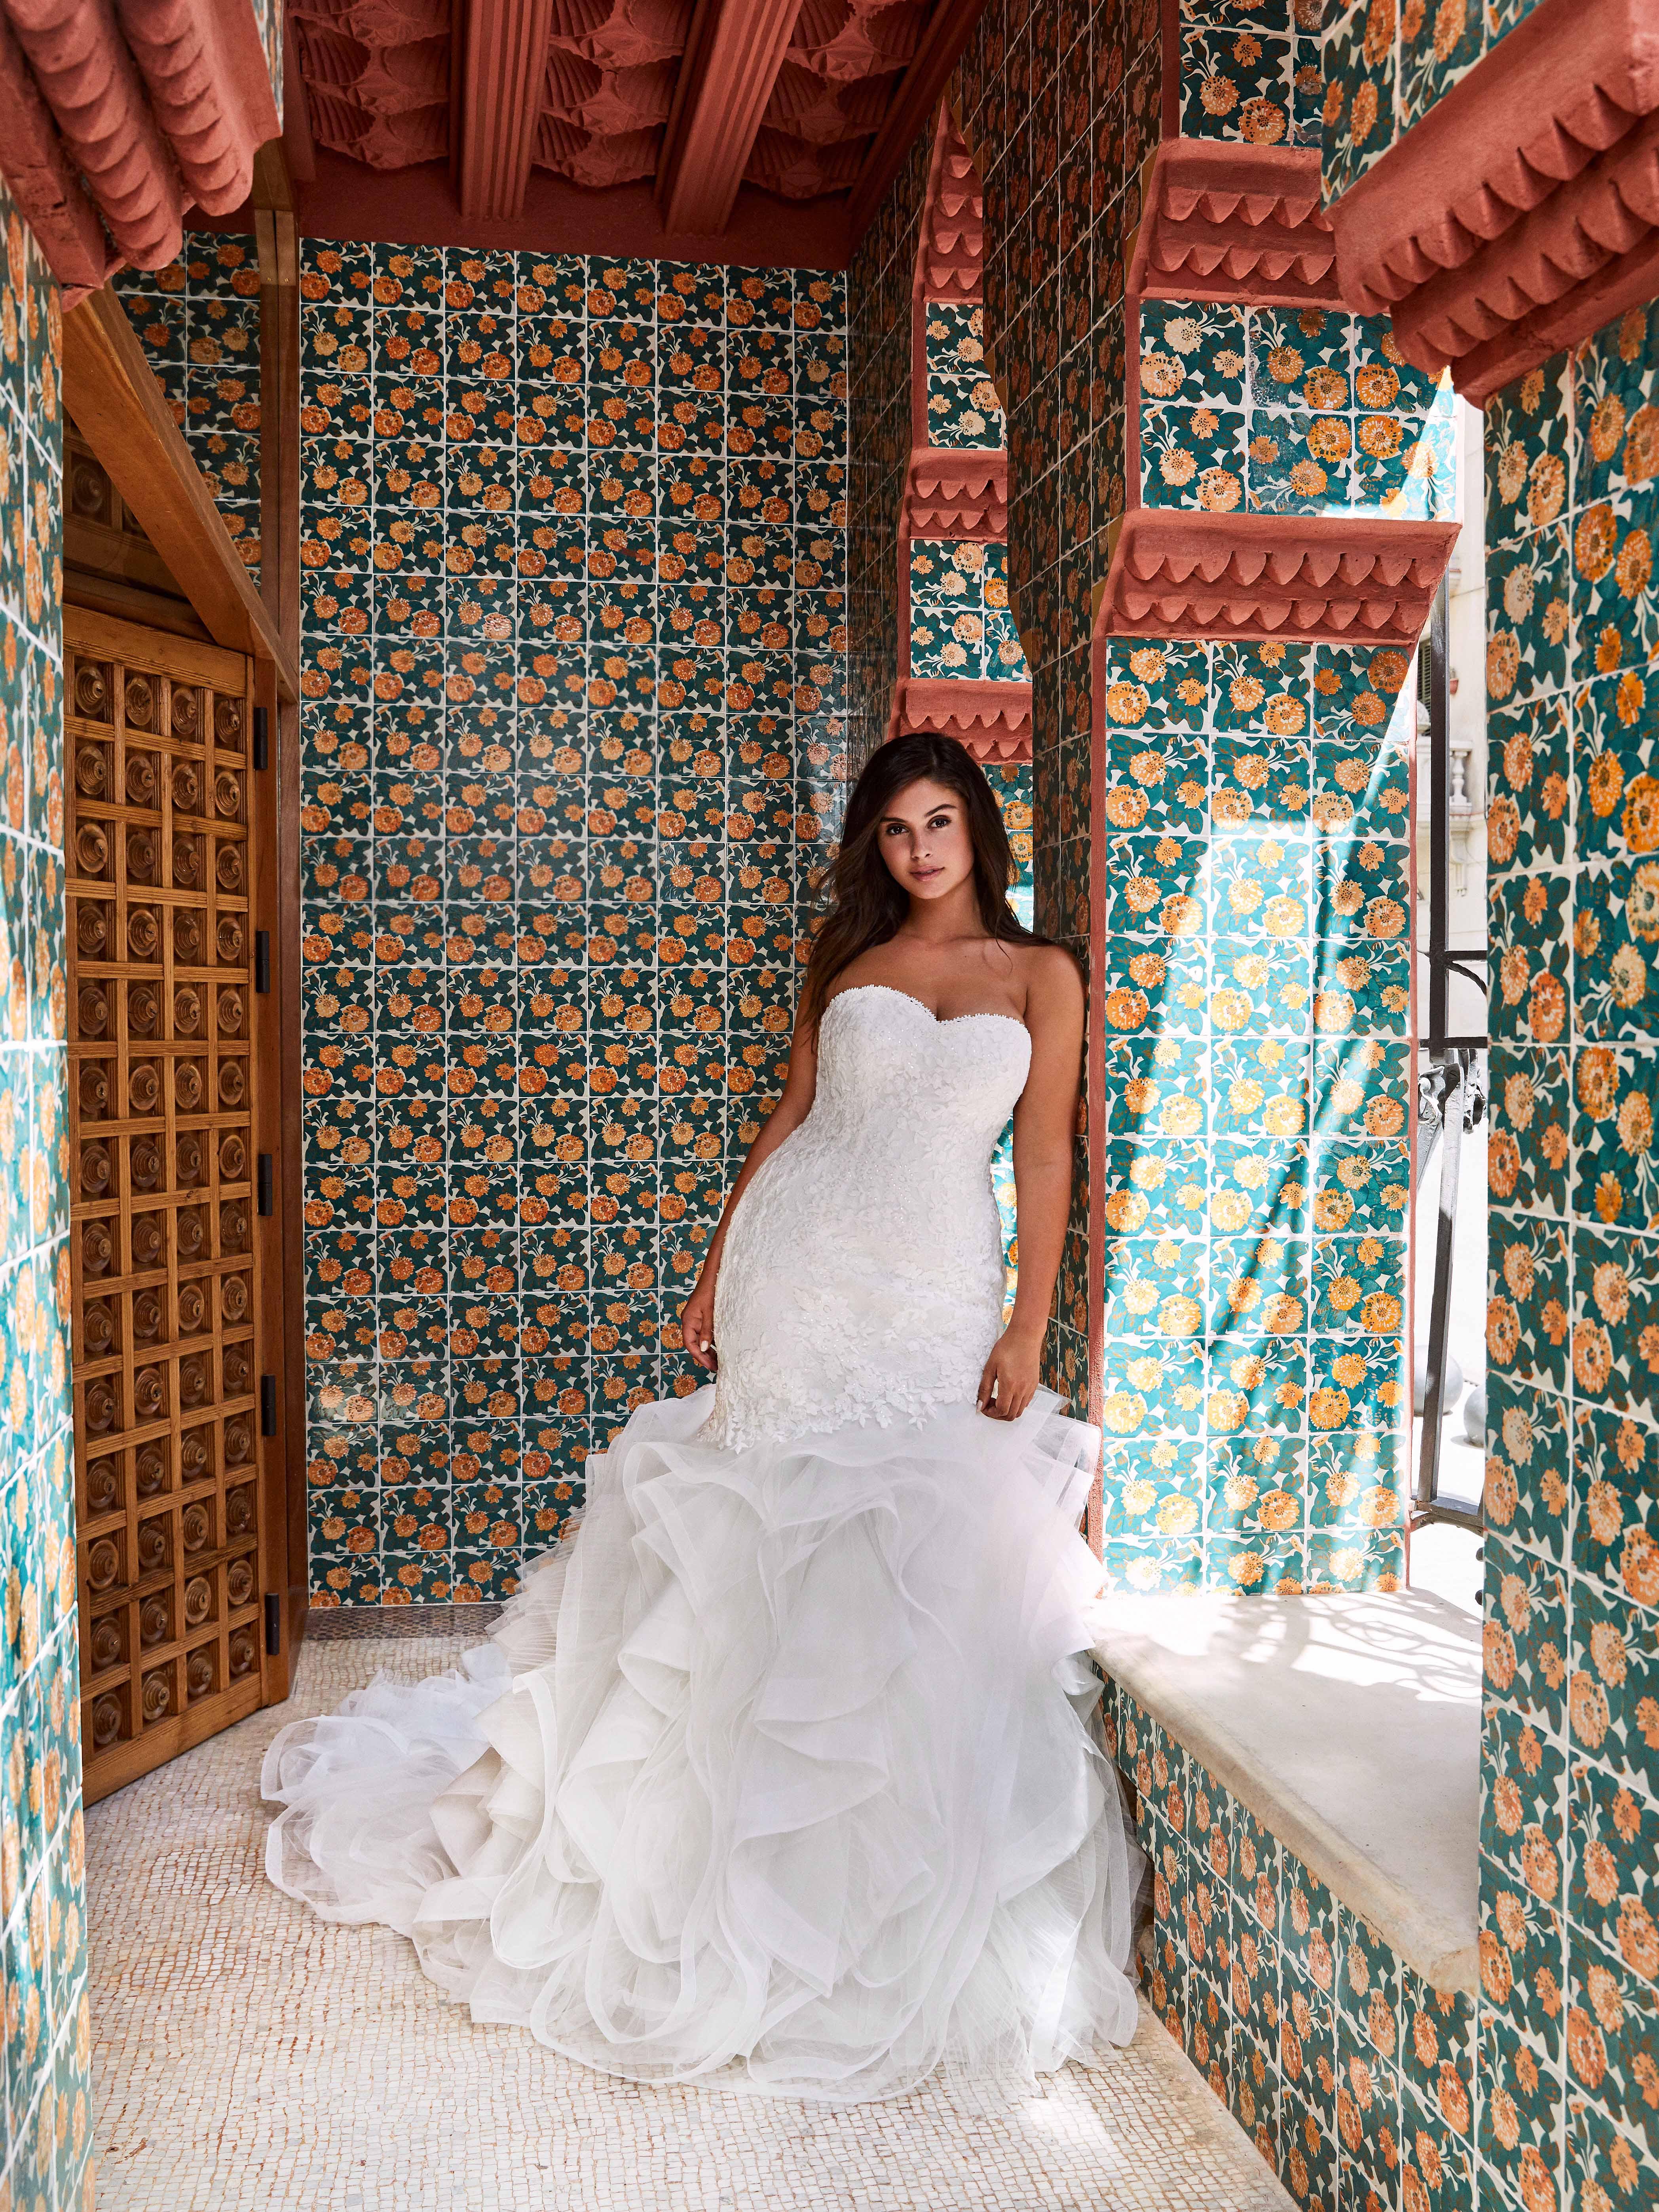 pronovias kleinfeld wedding dress fall 2019 08